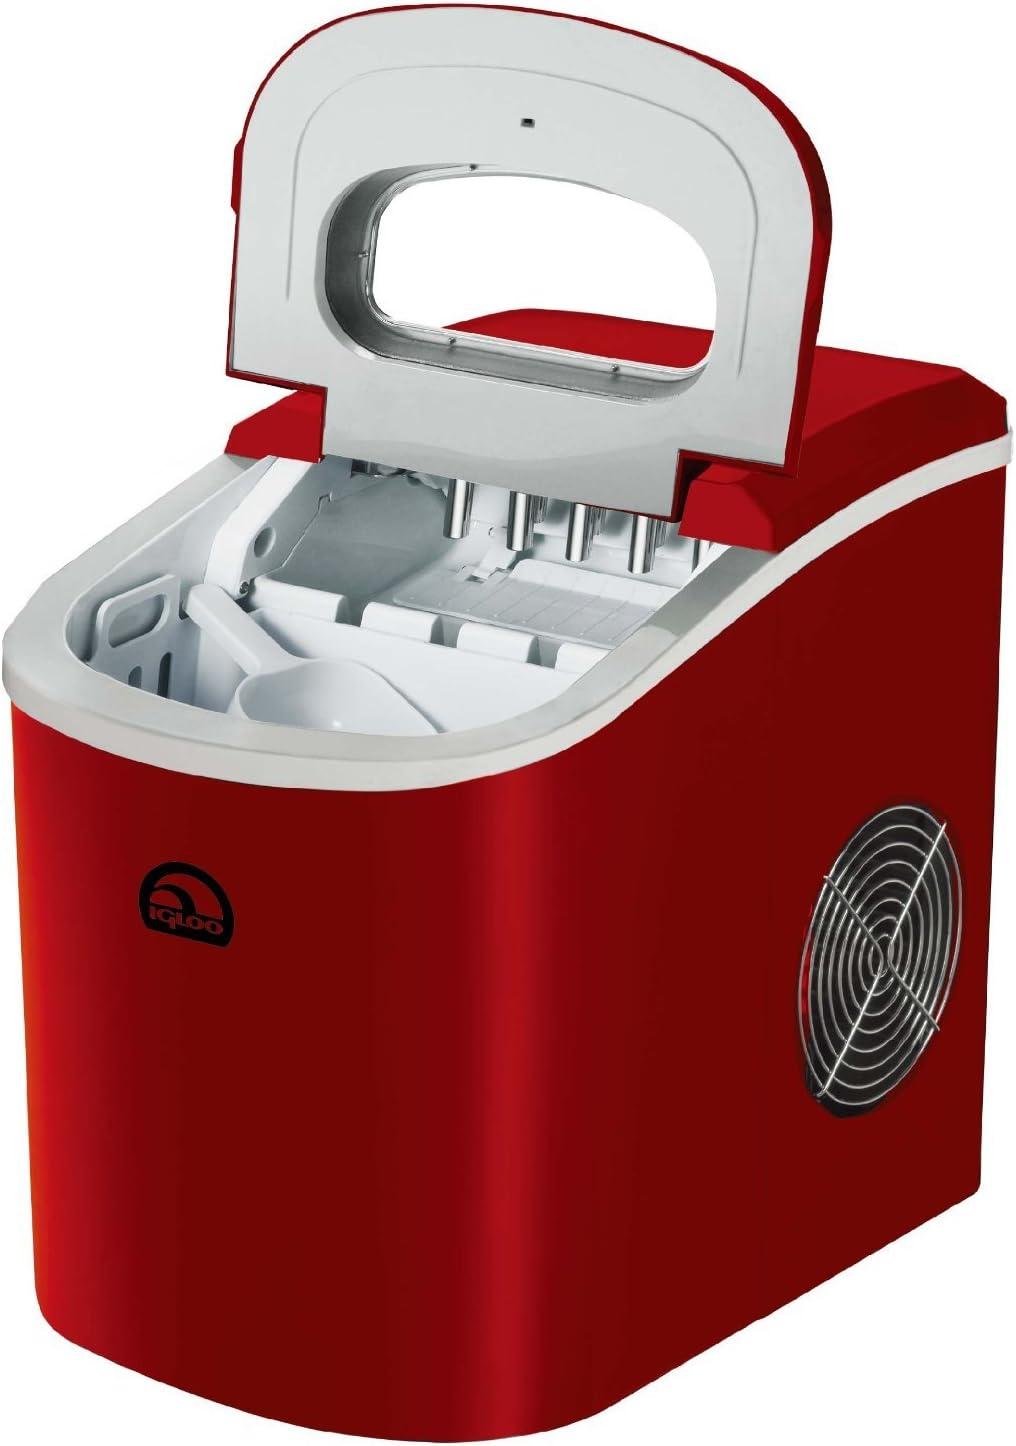 iGloo ICE102-Red Compact Ice Maker Renewed Red